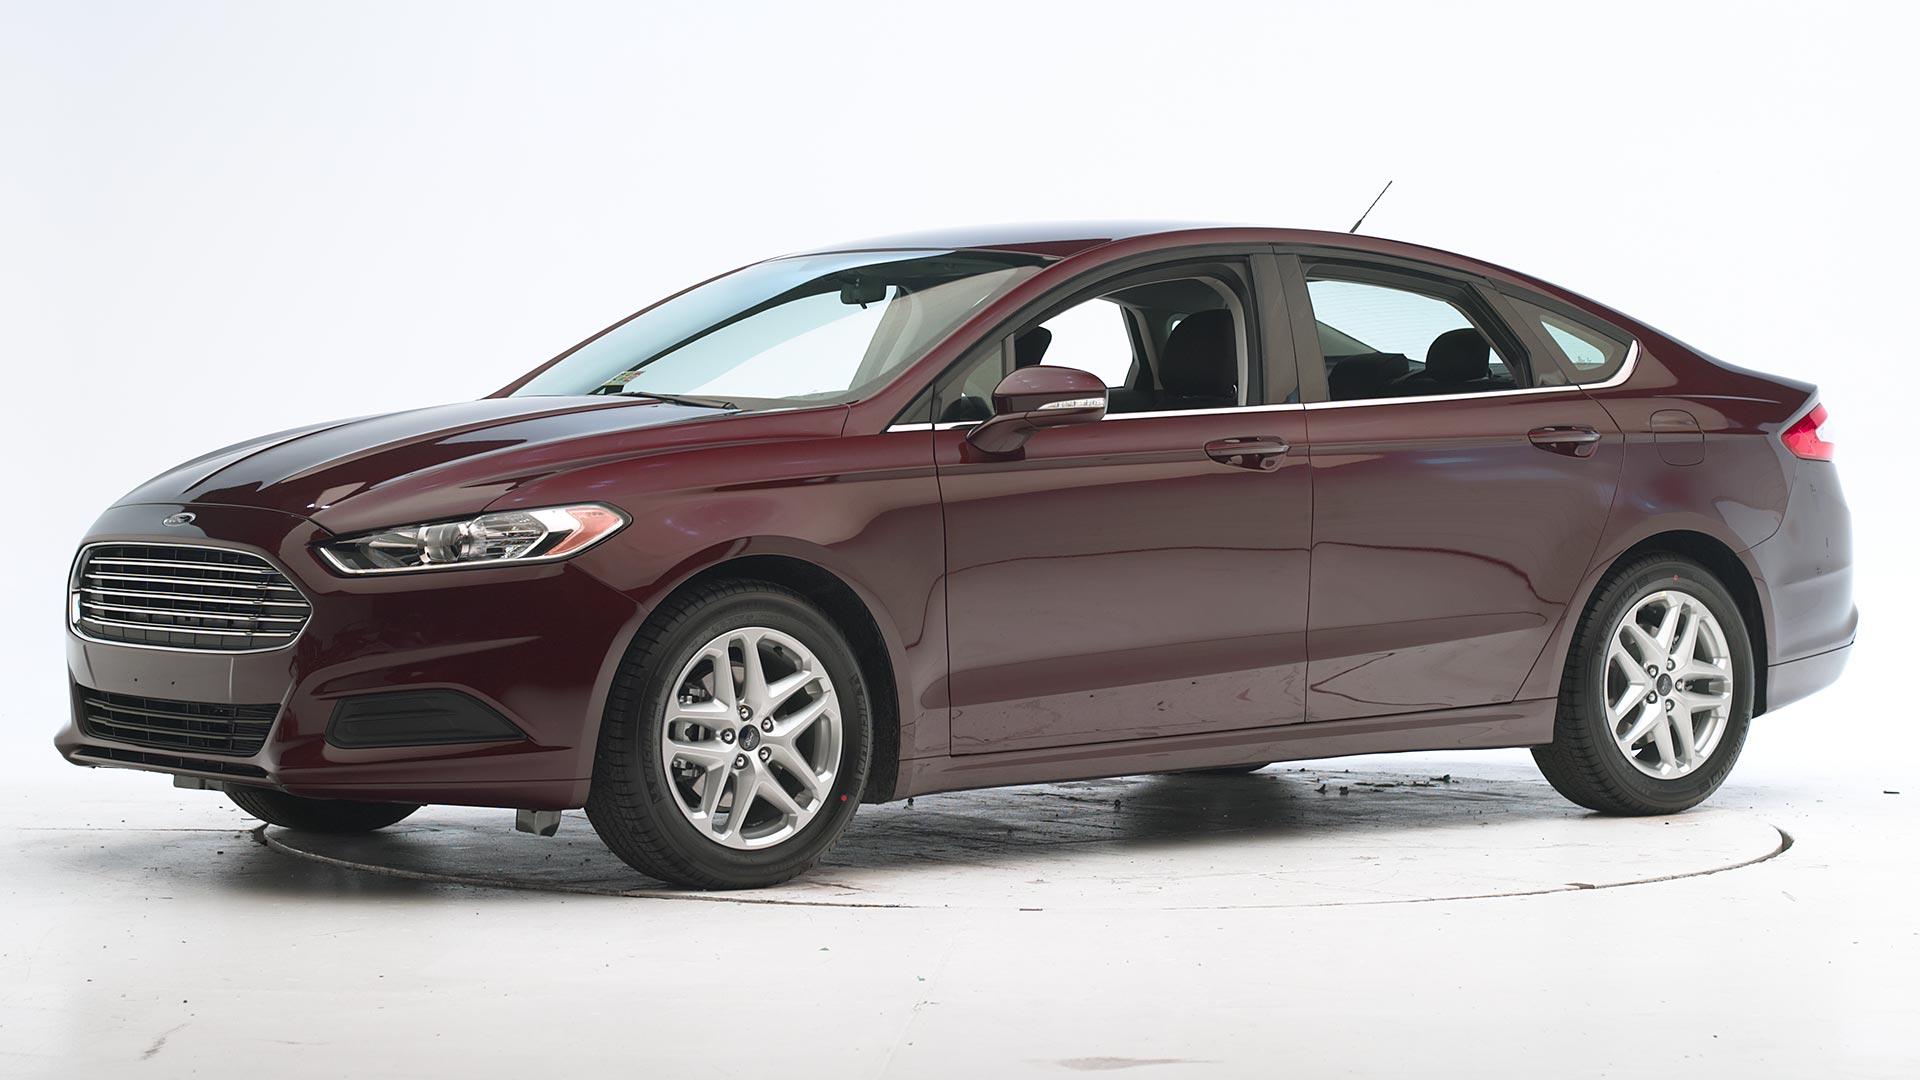 2017 Ford Fusion 4 Door Sedan